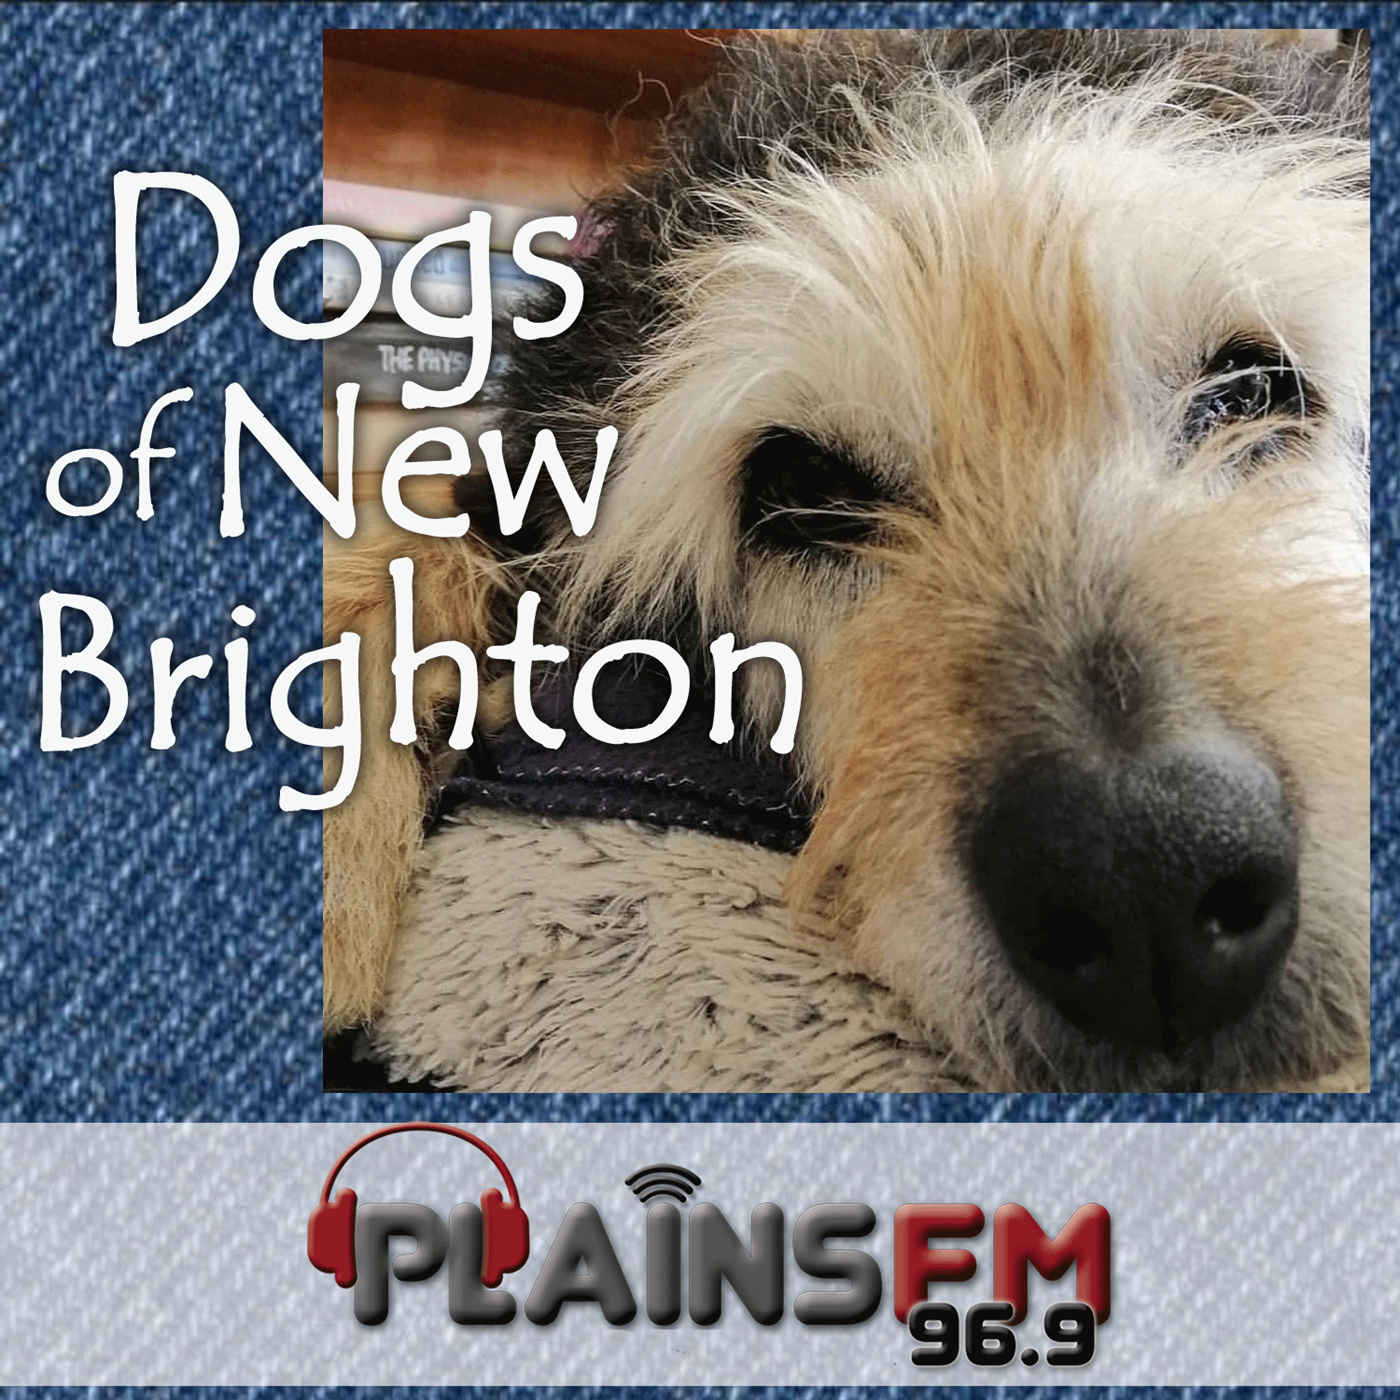 https://cdn.accessradio.org/StationFolder/plainsfm/Images/DogsofNewBrighton.png